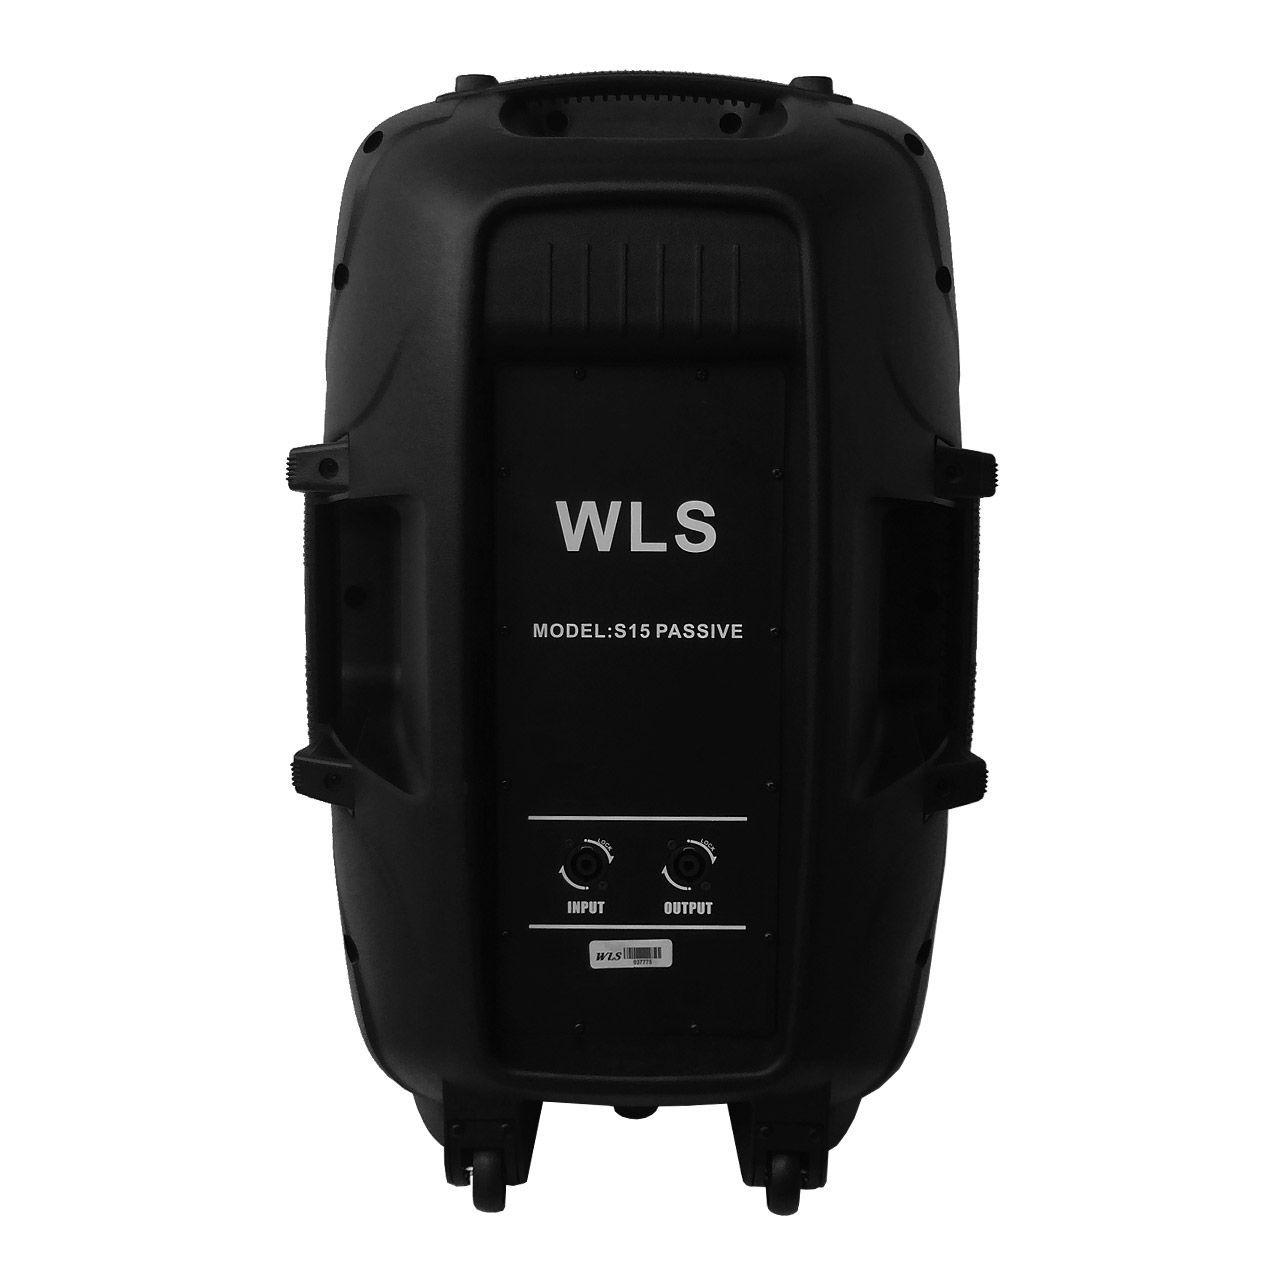 Kit Caixa De Som Ativa Passiva Wls S15 Bluetooth 430w Rms + Tripe Cabo